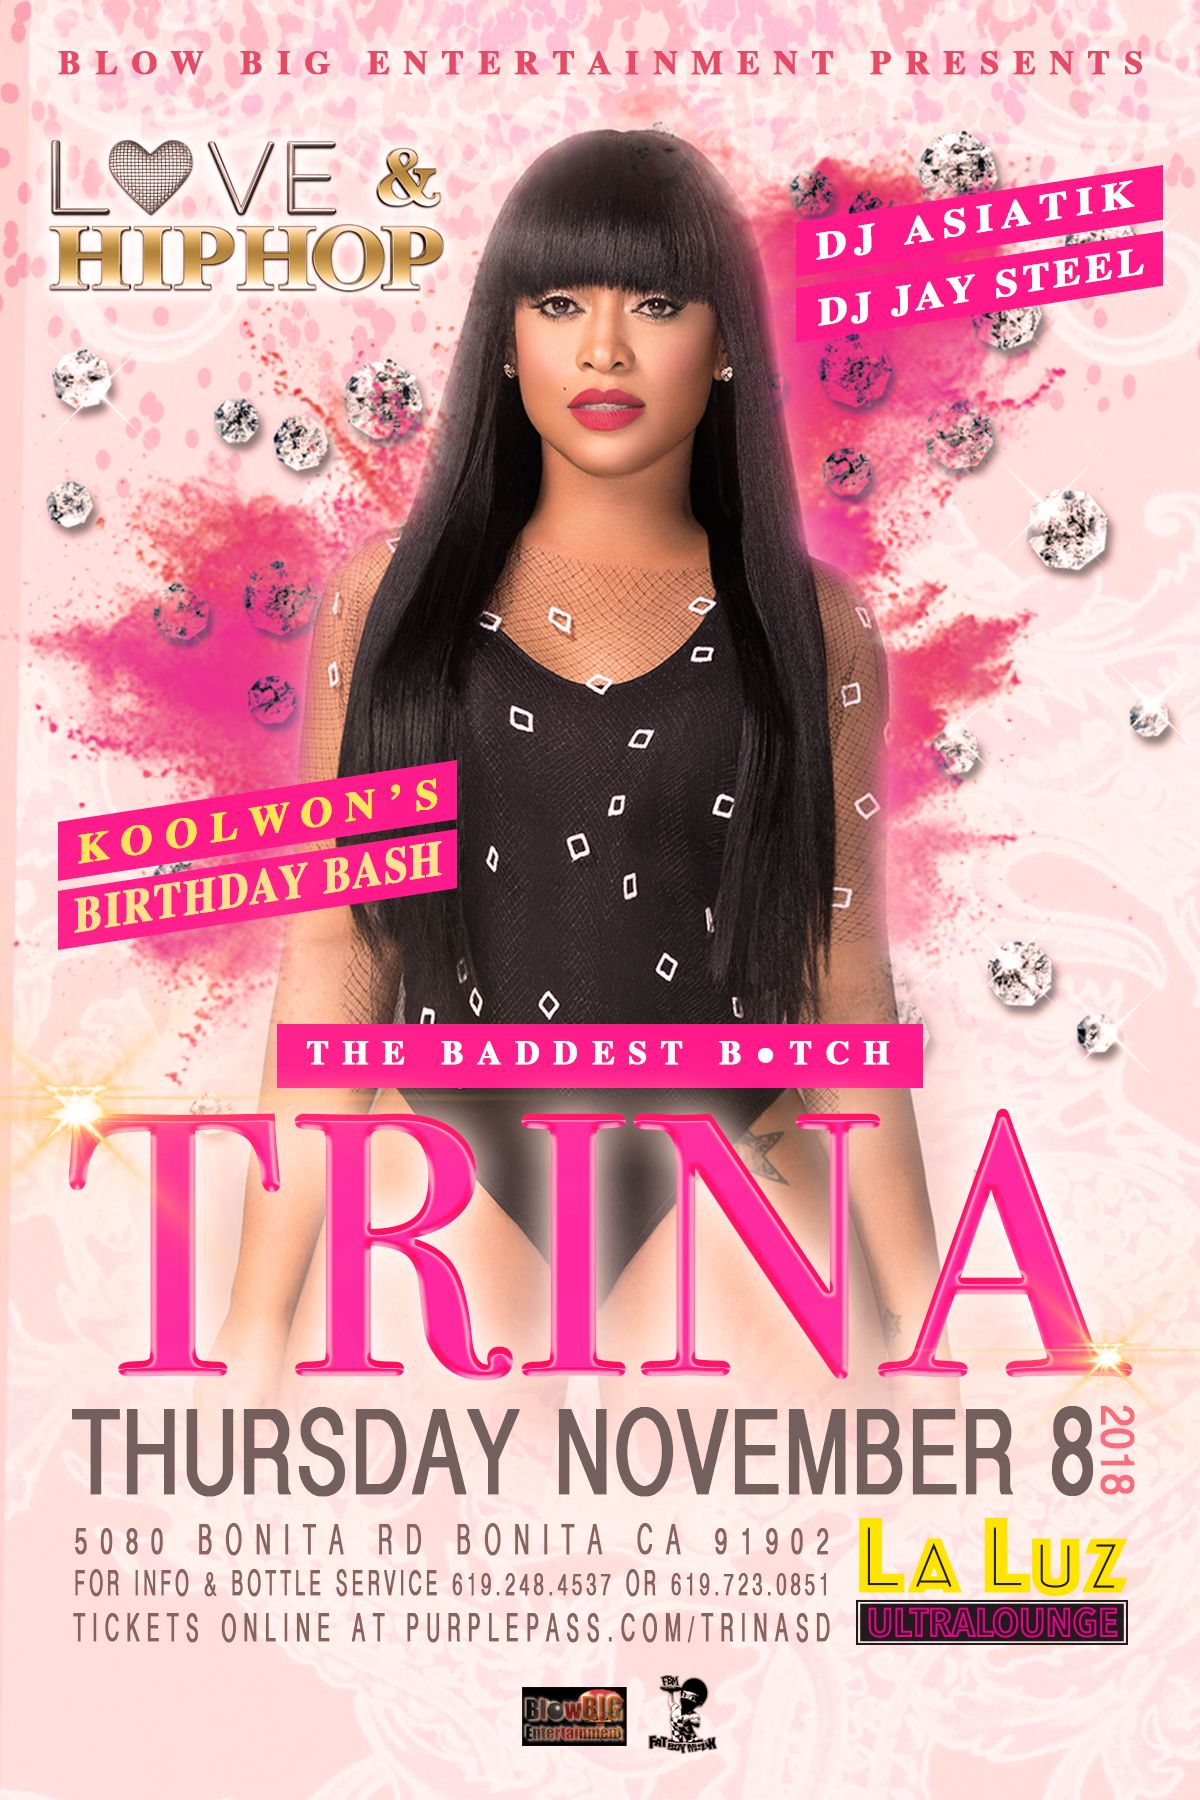 Trina the Baddest